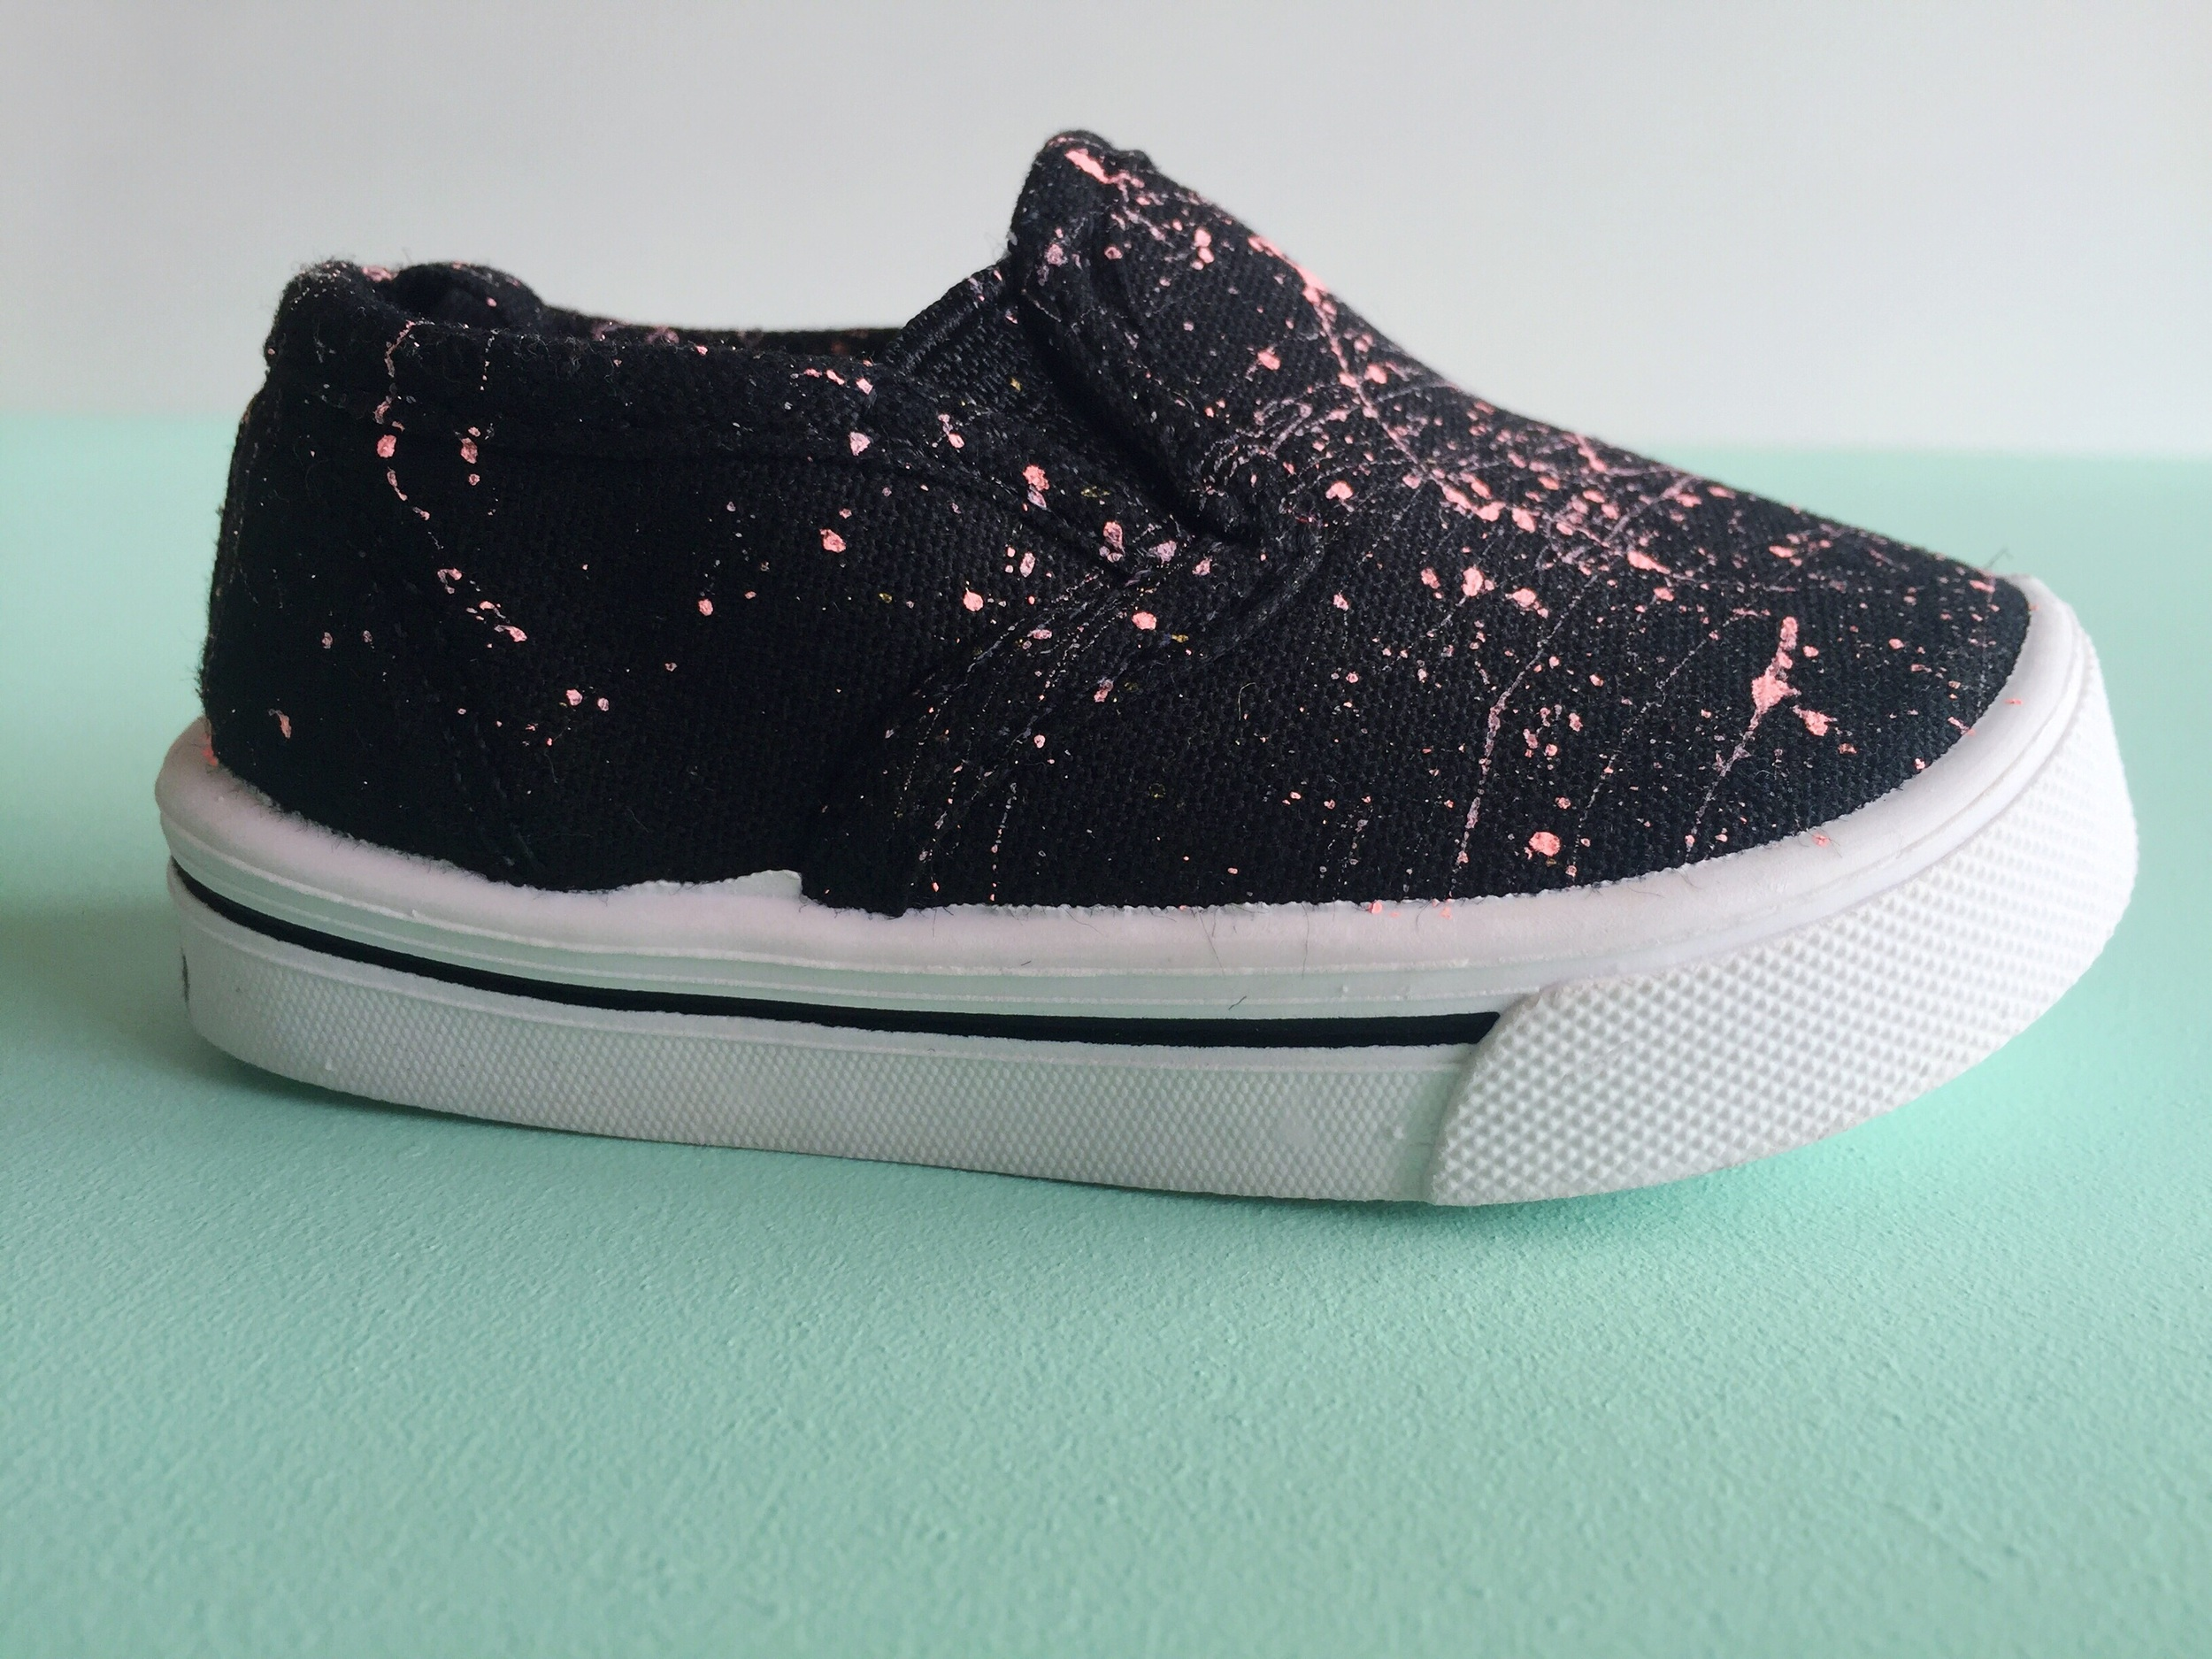 DIY mini splatter paint shoes.